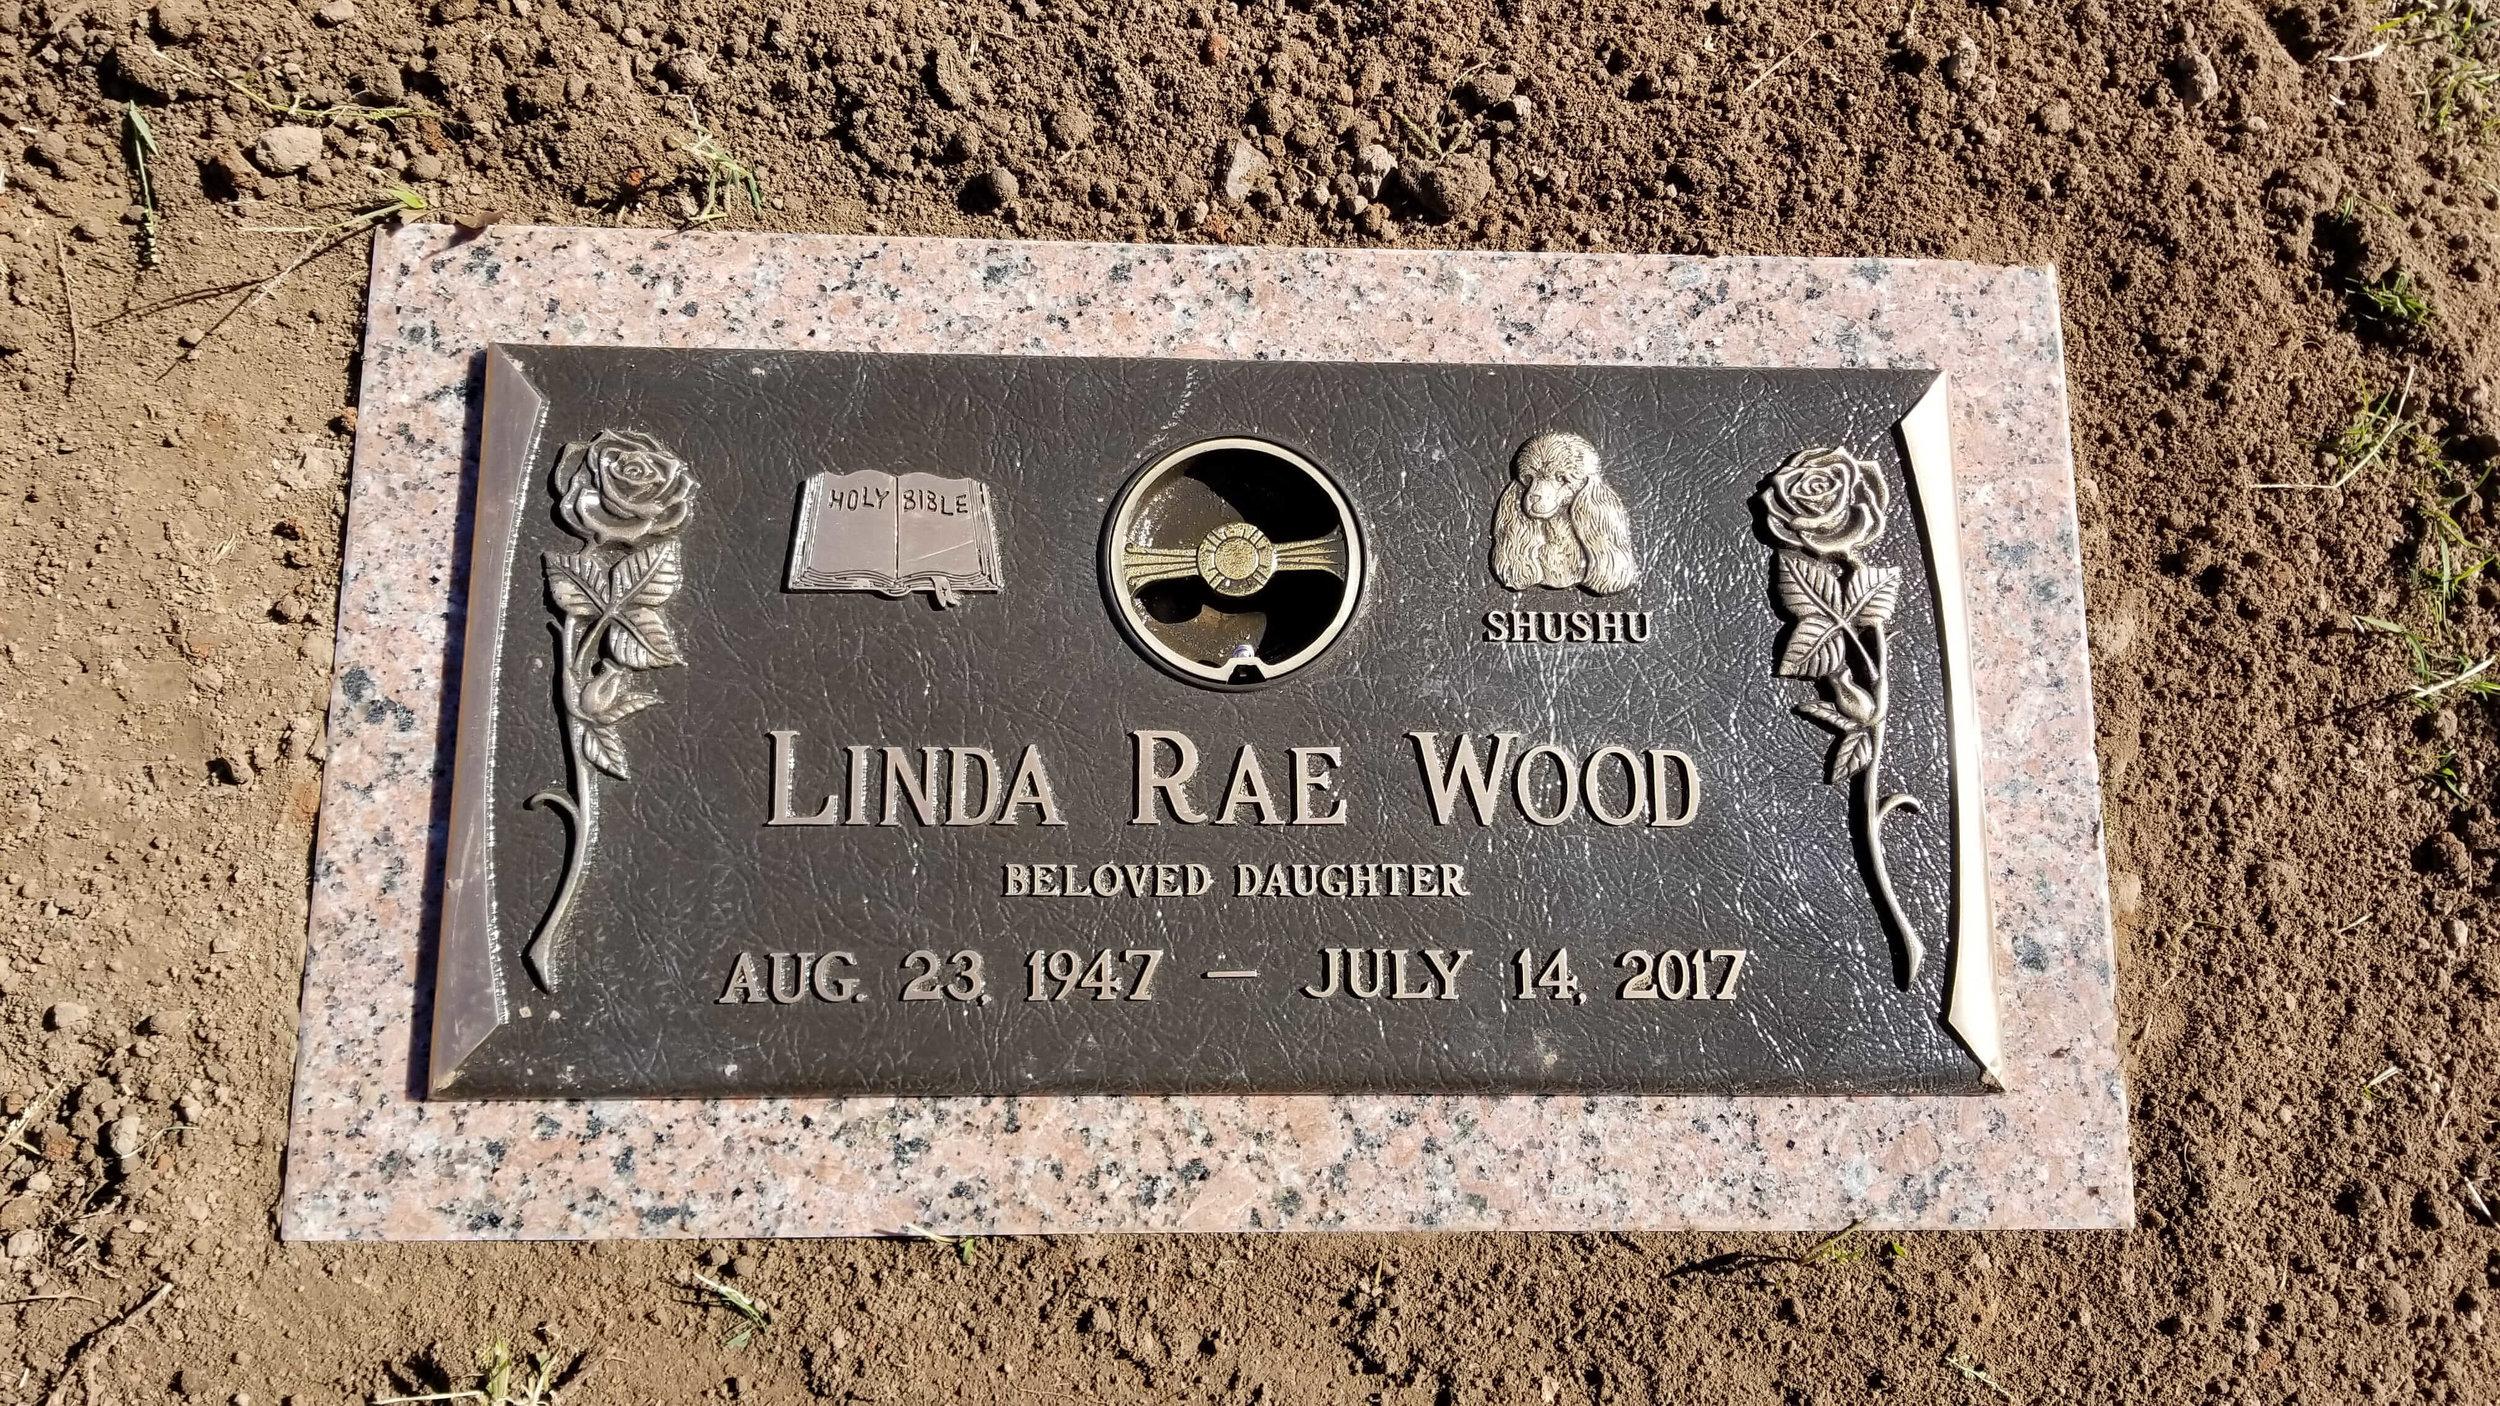 12. Memorial Park Cemetery